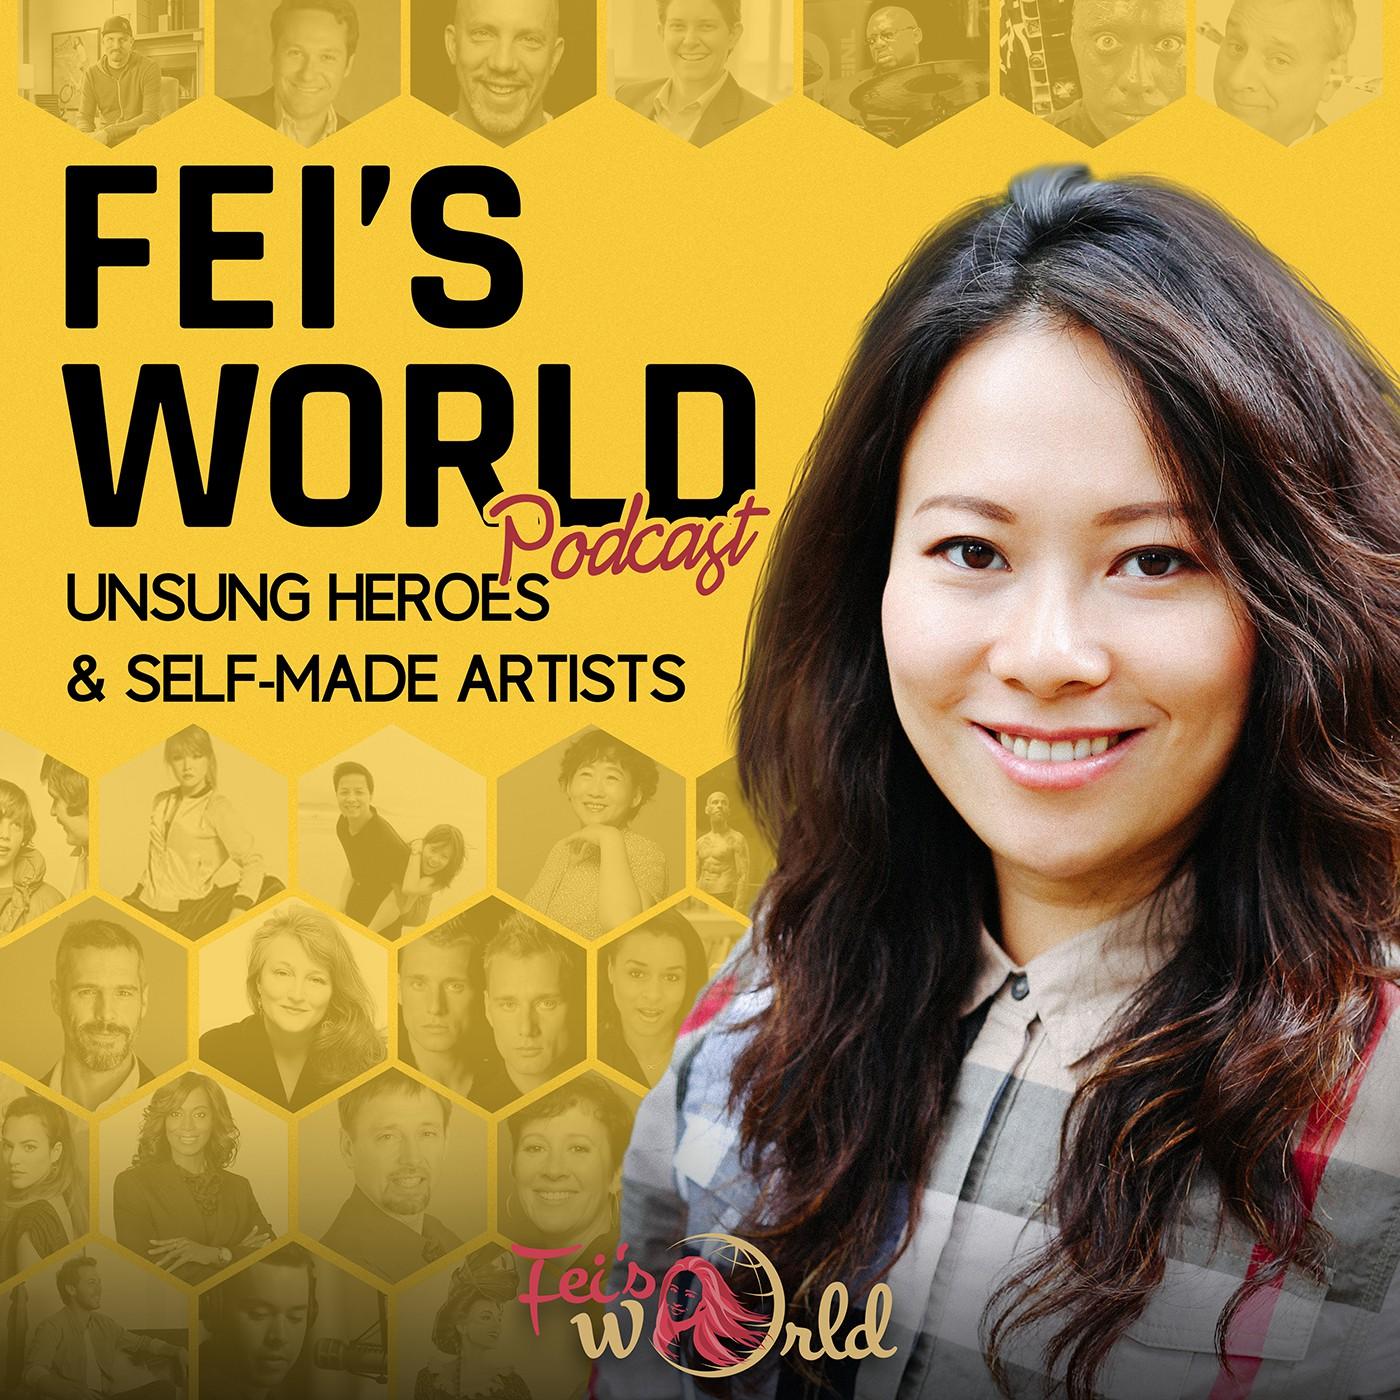 Design a Podcast Cover Art for Feisworld Podcast